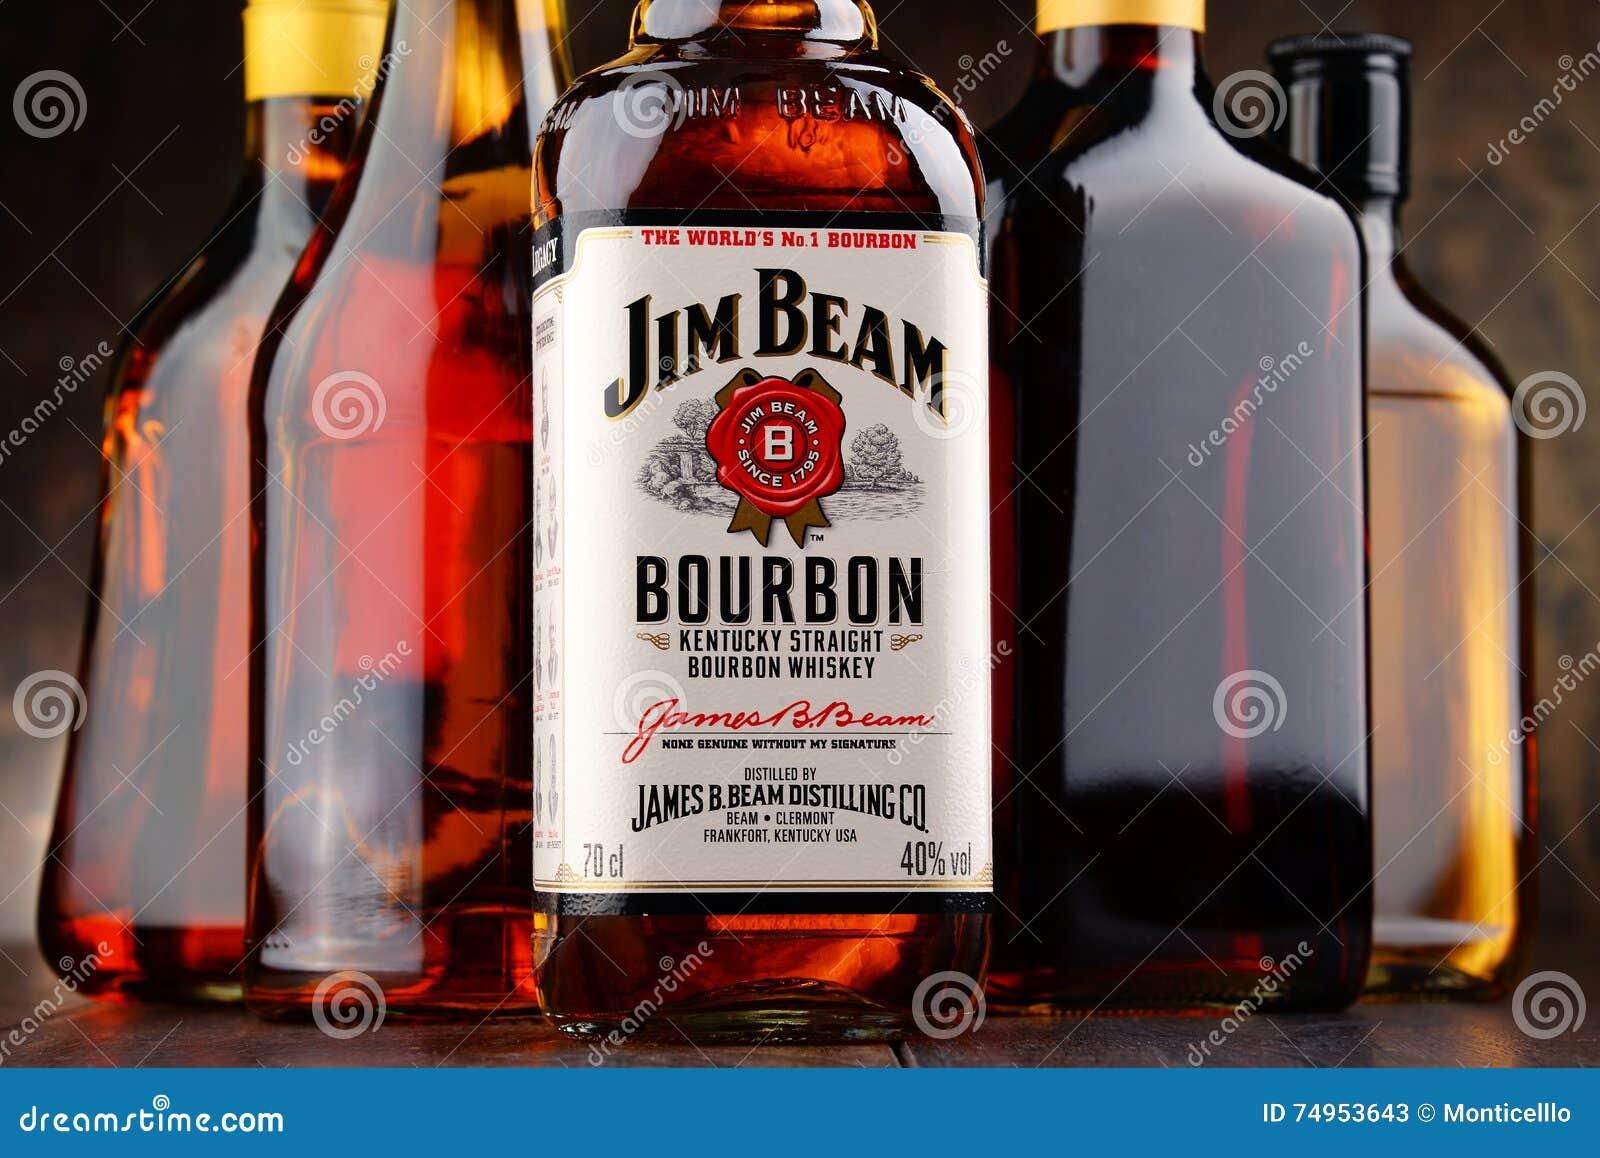 bottle of jim beam bourbon editorial stock photo image of beam